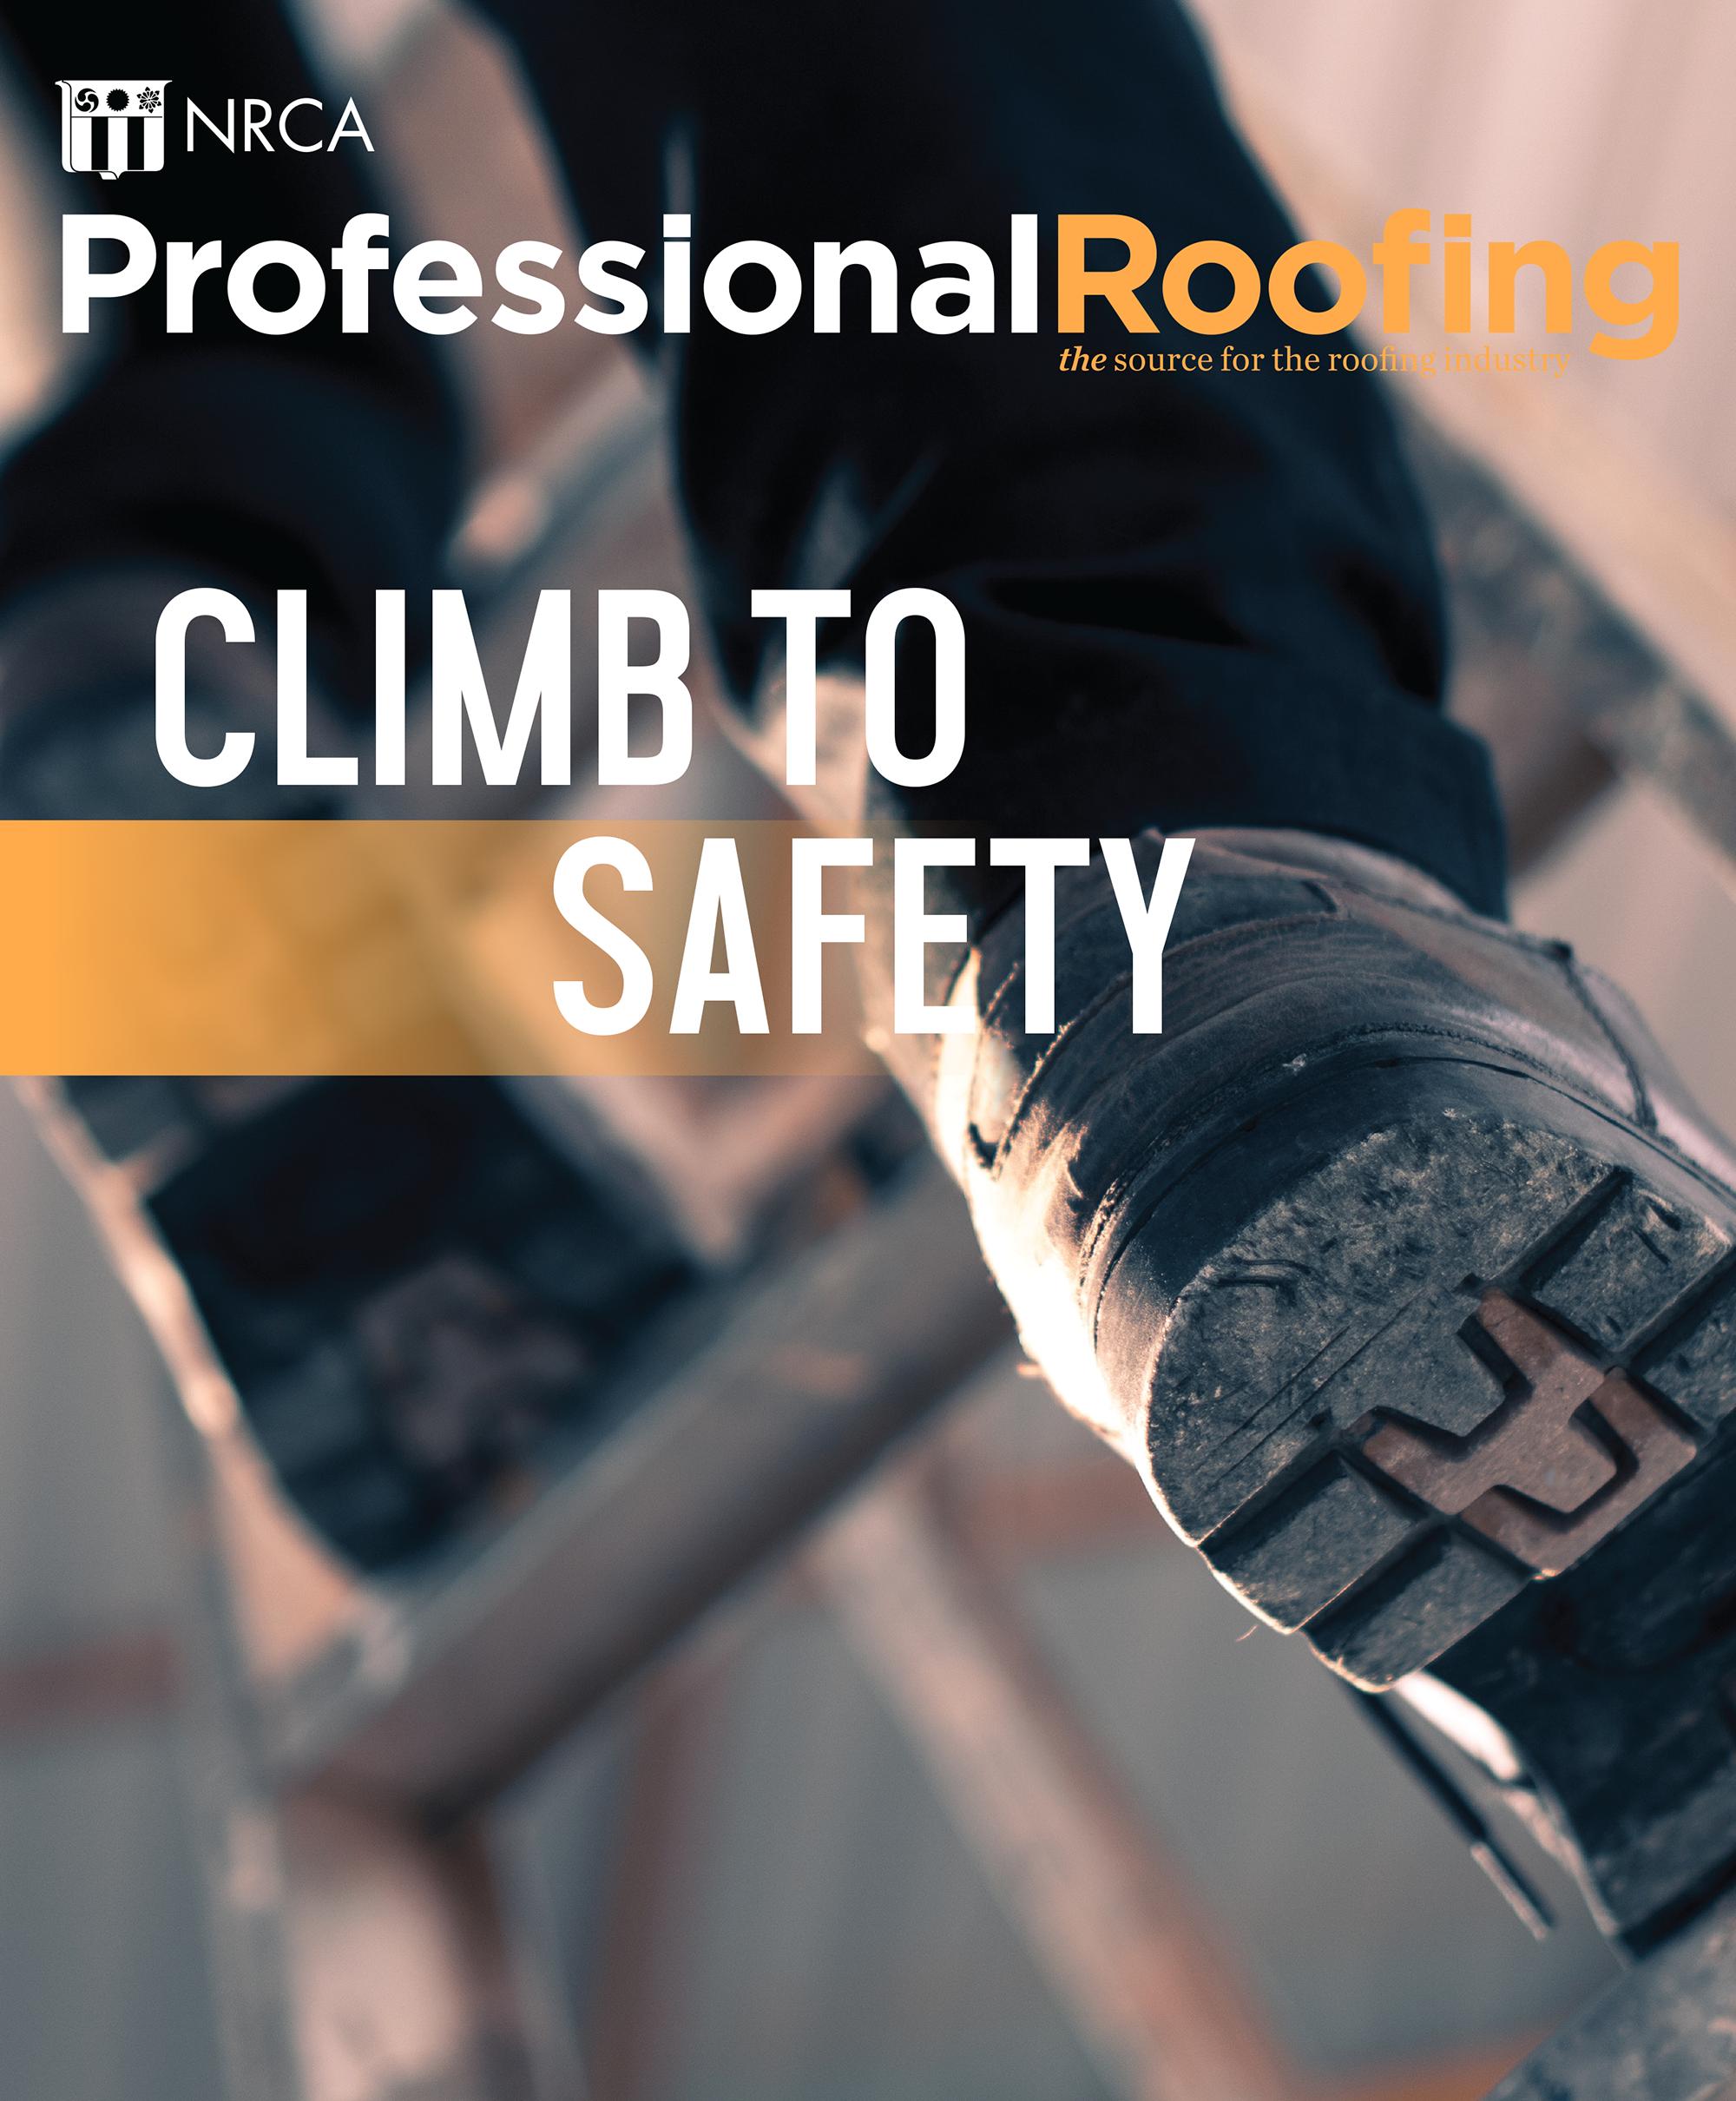 Professional Roofing Magazine 11/1/2019